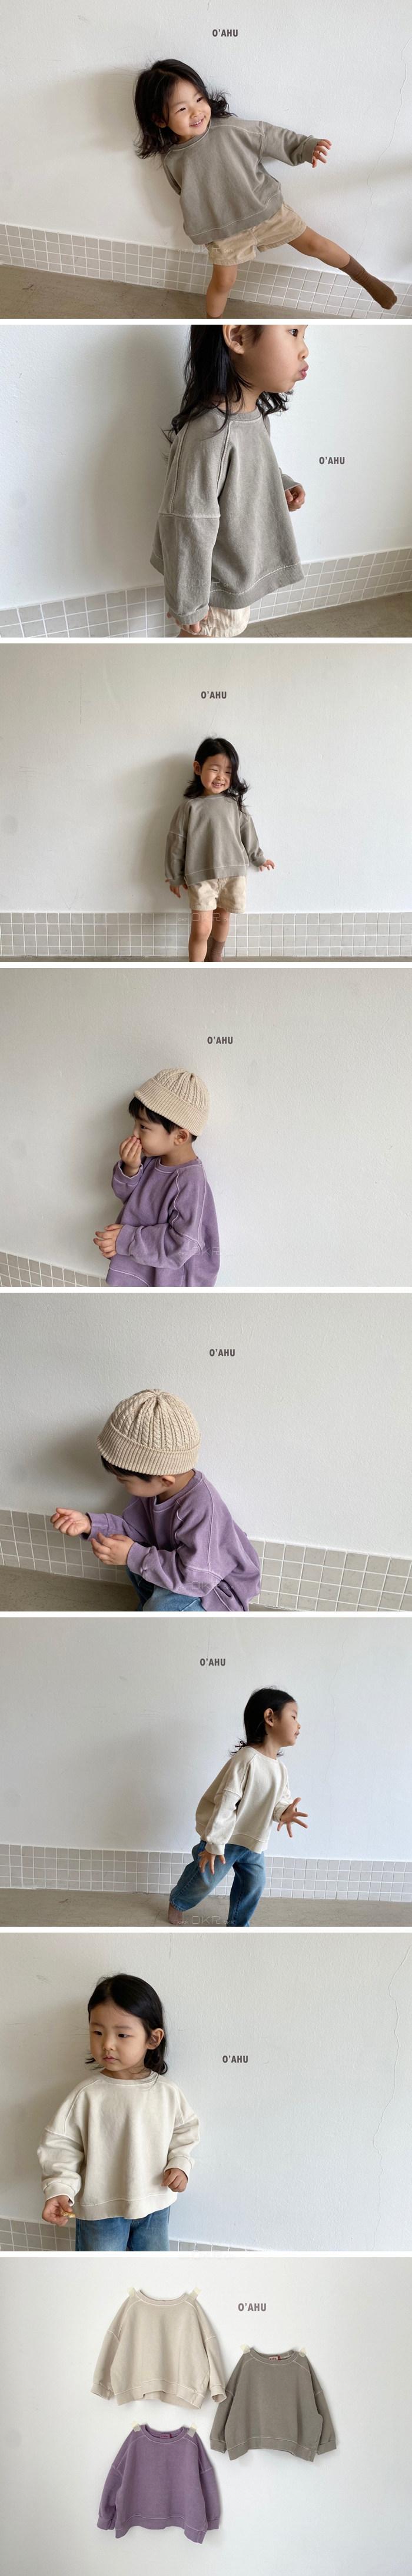 O'AHU - Korean Children Fashion - #Kfashion4kids - Purge Dying MTM with Mom